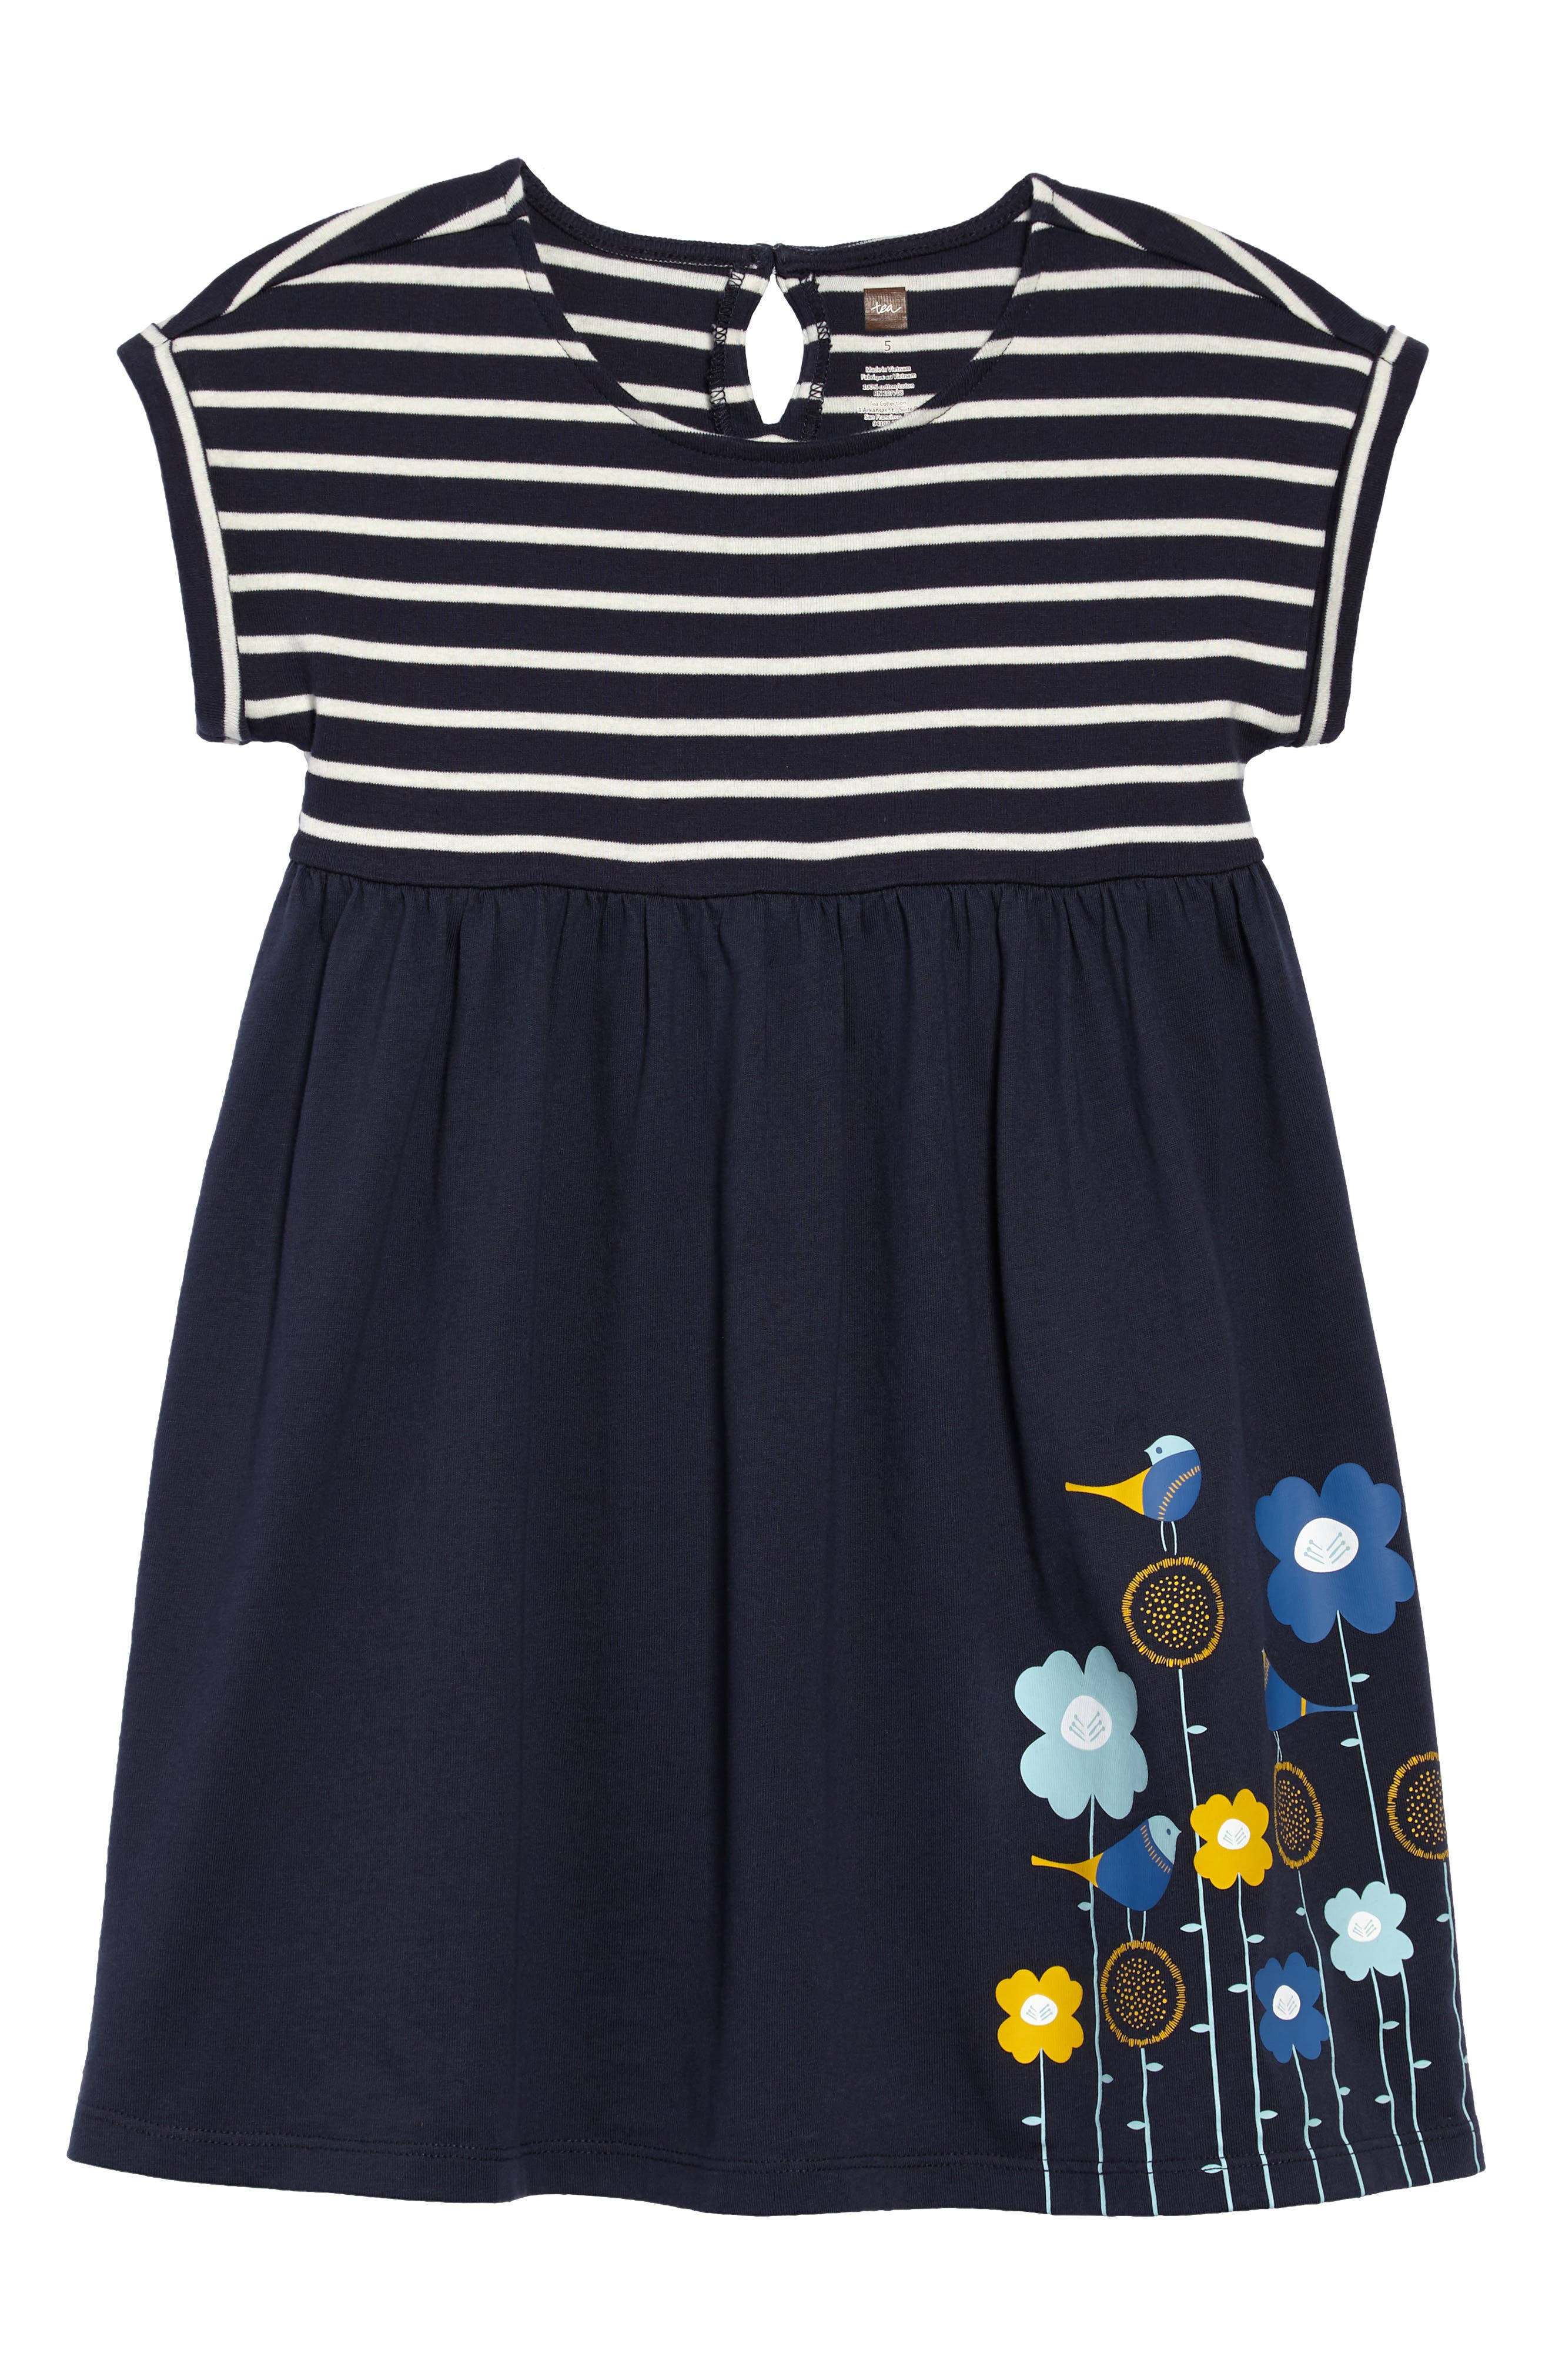 Stripe & Floral Print Dress,                             Main thumbnail 1, color,                             411